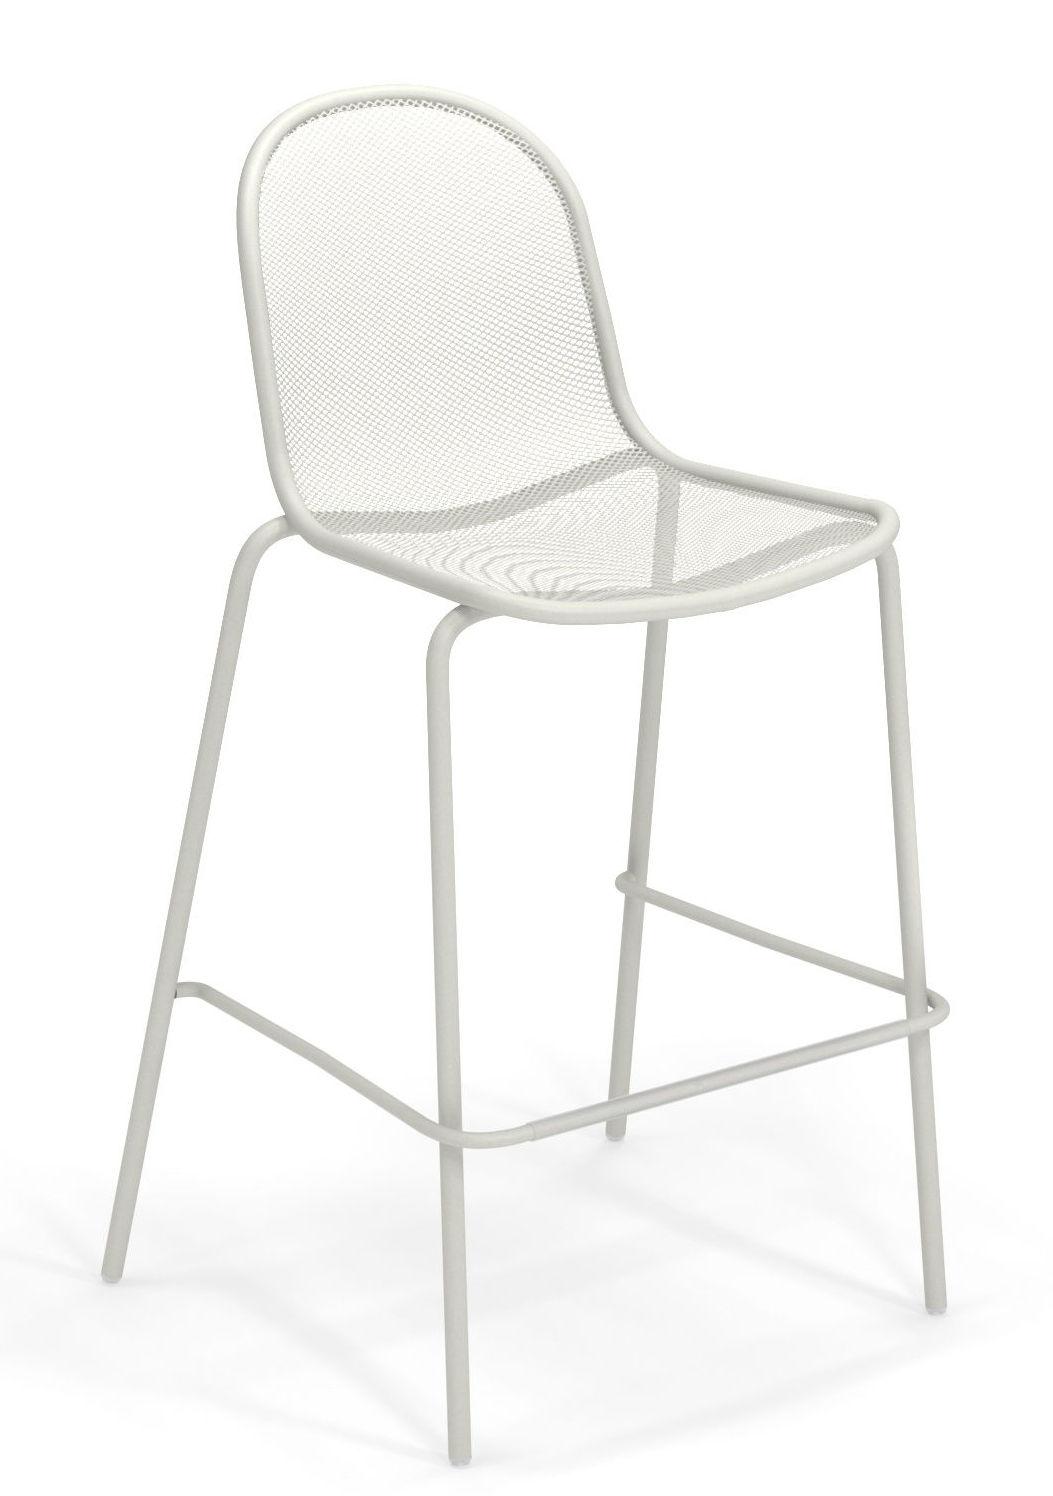 Furniture - Bar Stools - Nova Bar chair - / Metal - H 72 cm by Emu - White - Varnished steel